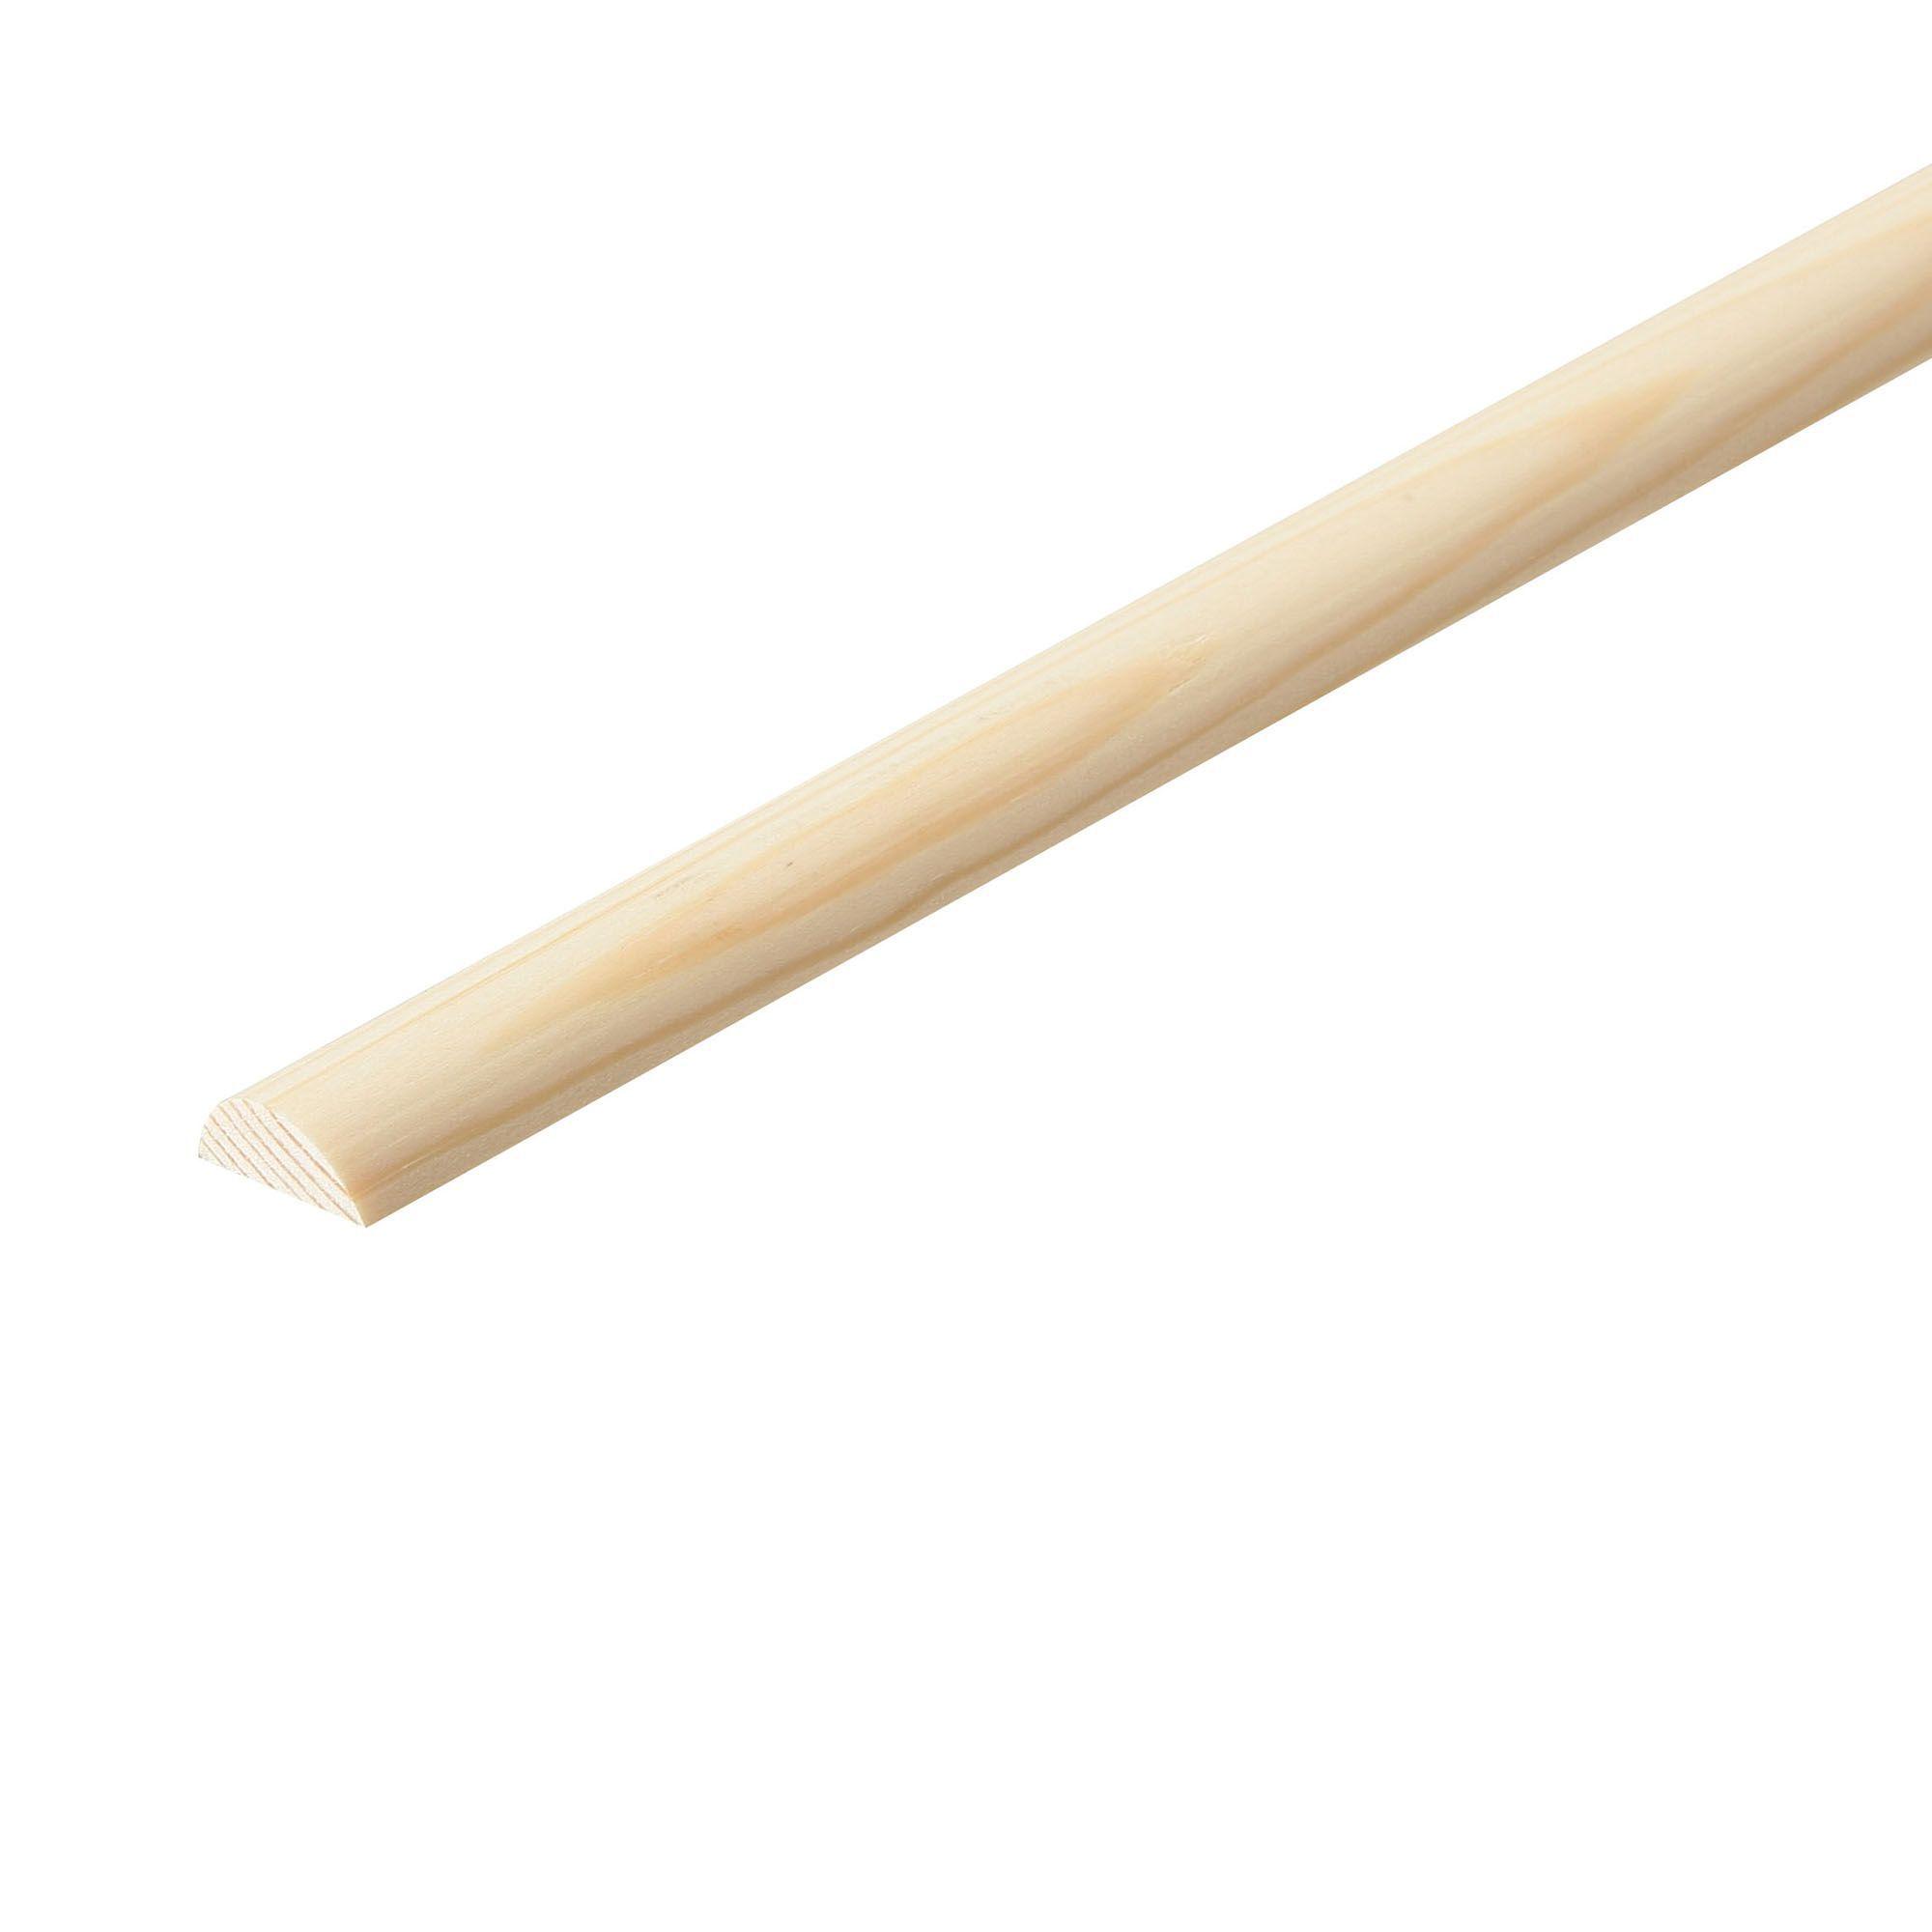 Pine Half dowel moulding (T)14mm (W)6mm (L)2400mm